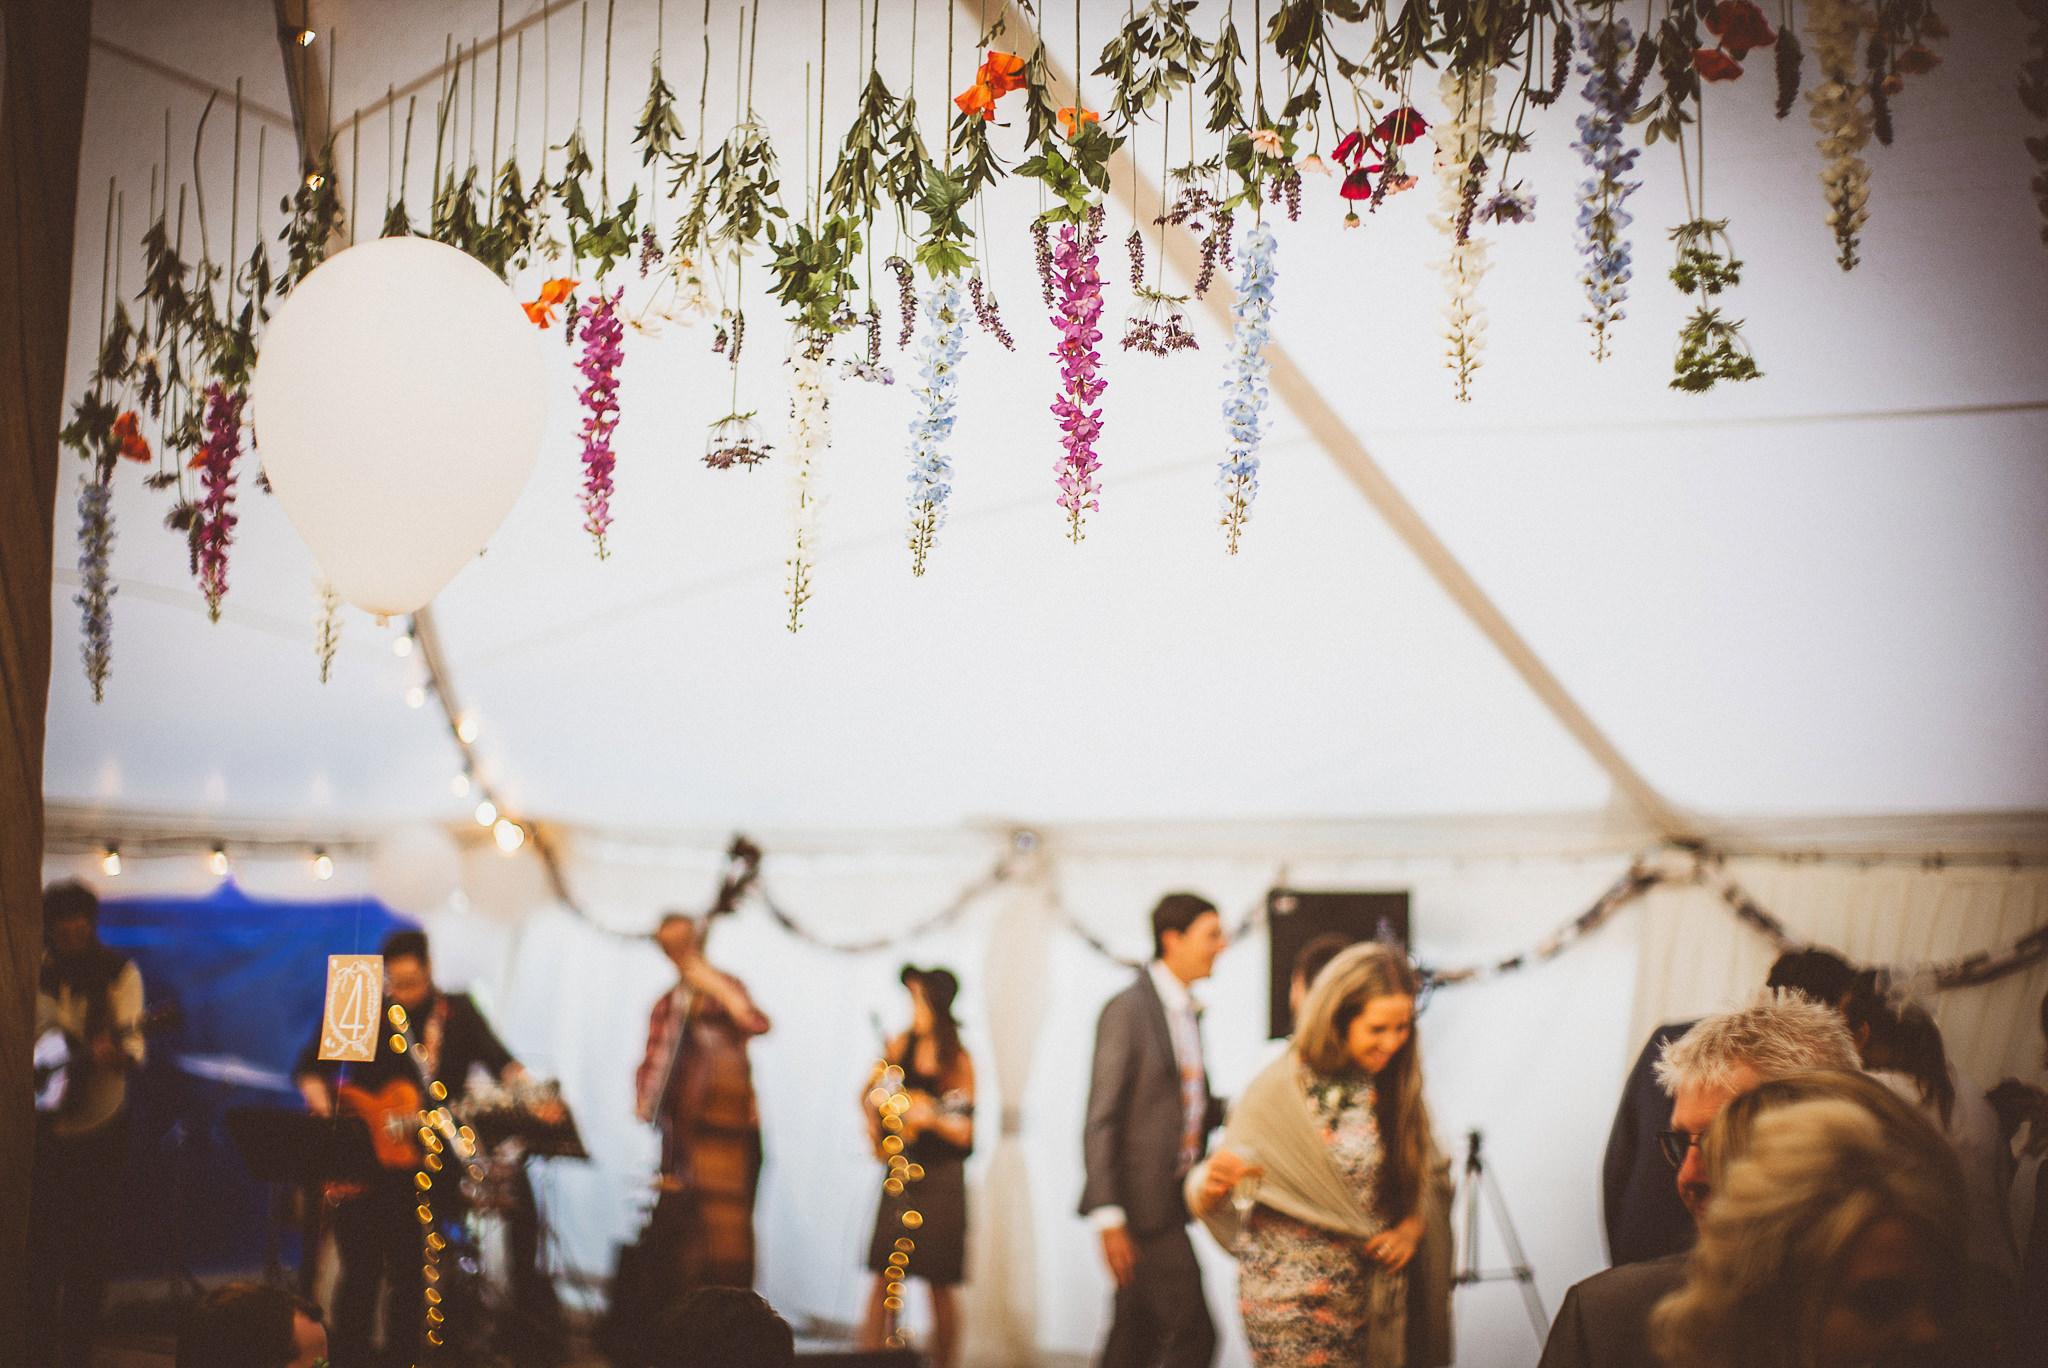 paul-marbrook-Farm-Wedding-Photographer-Lancashire-90093